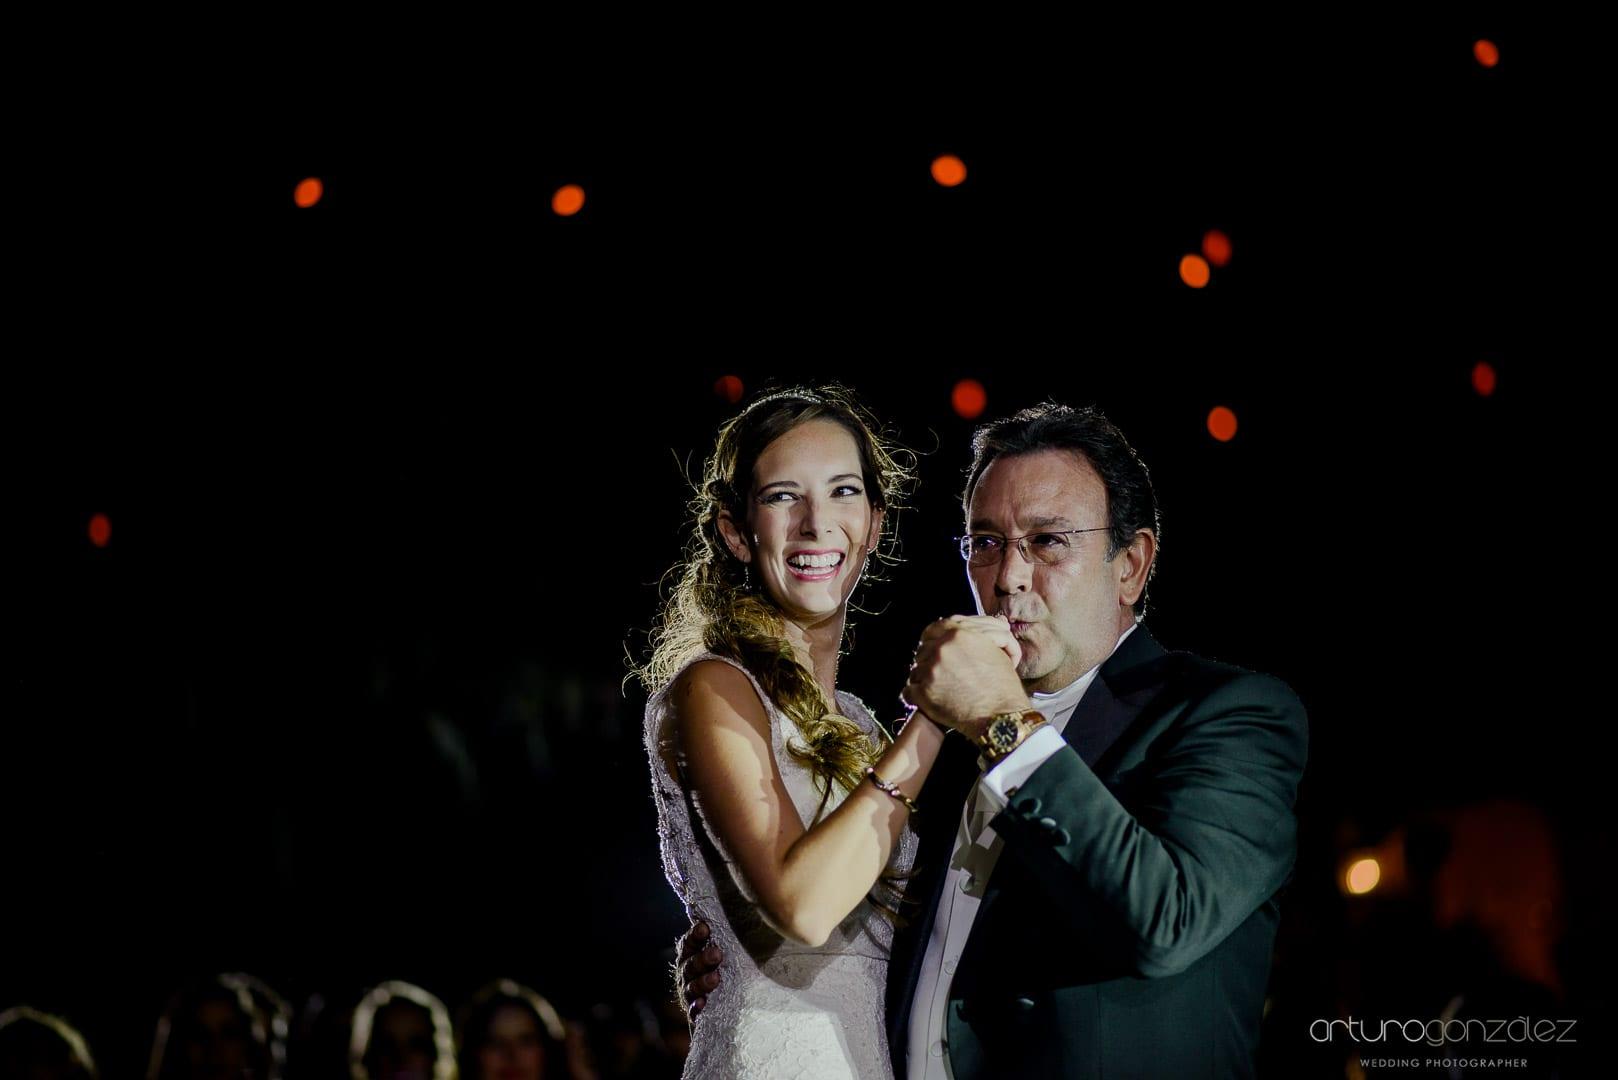 fotografo-de-bodas-en-guanajuato-117